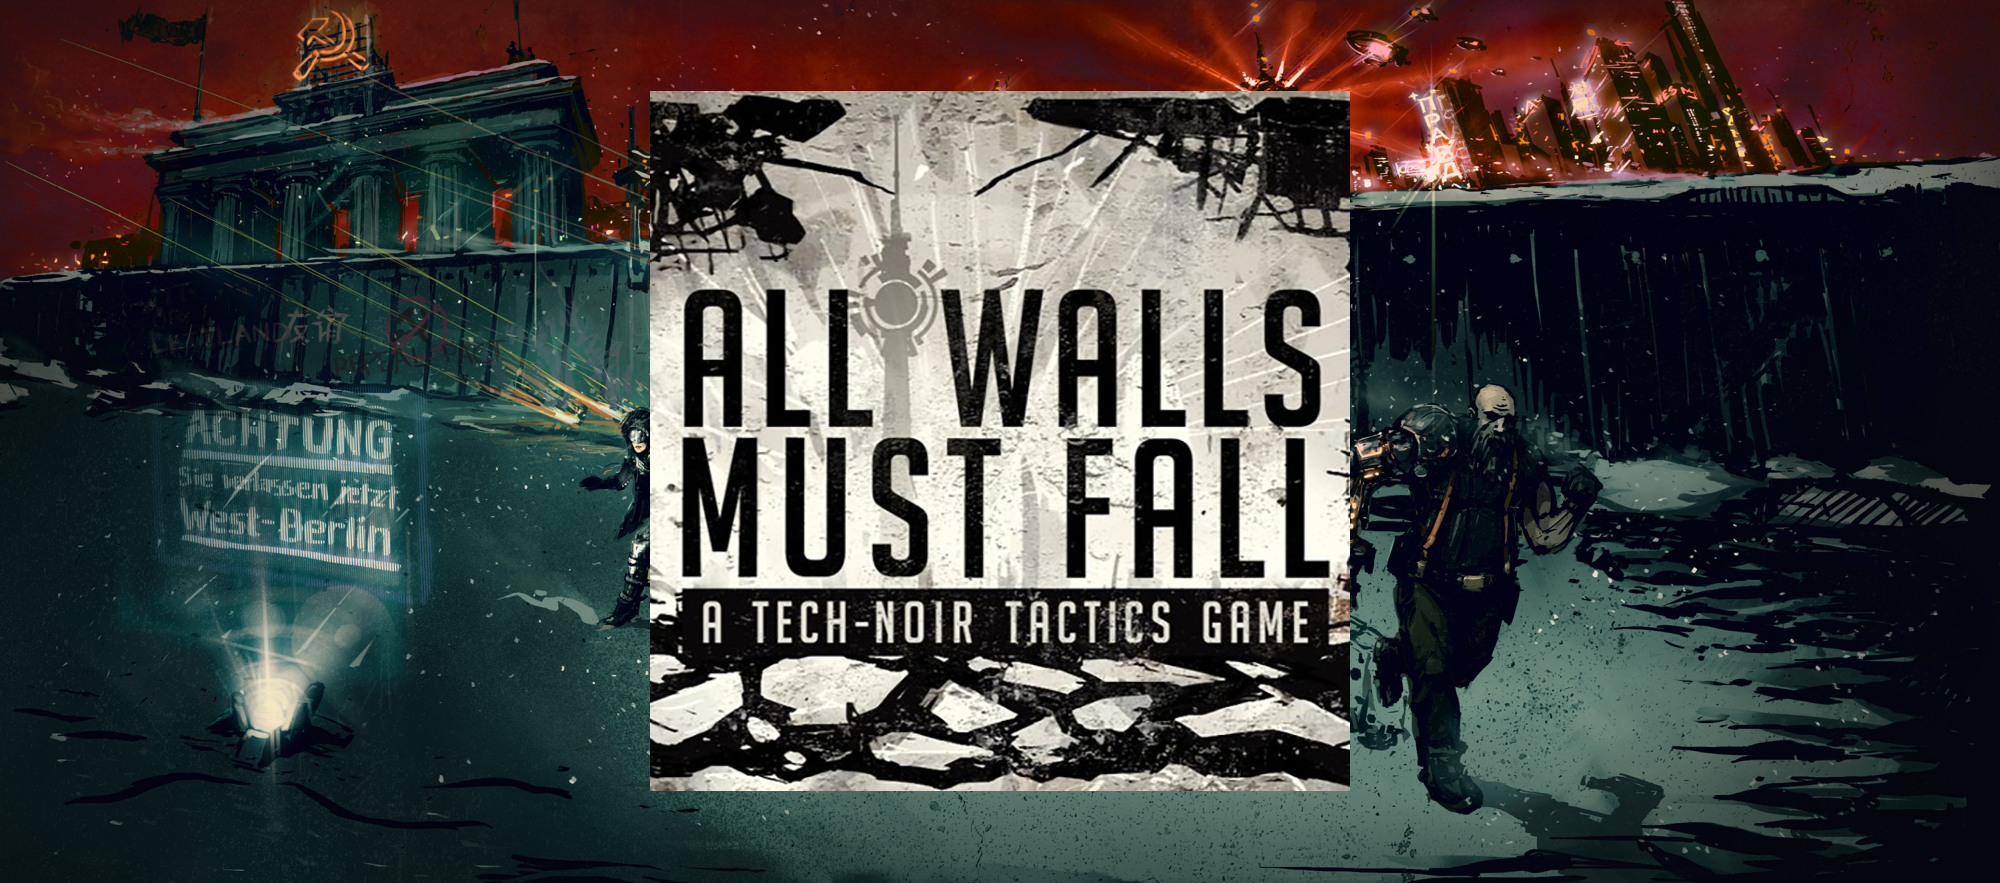 All Walls Must Fall Soundtrack Artwork on Handdrawn Wallpaper